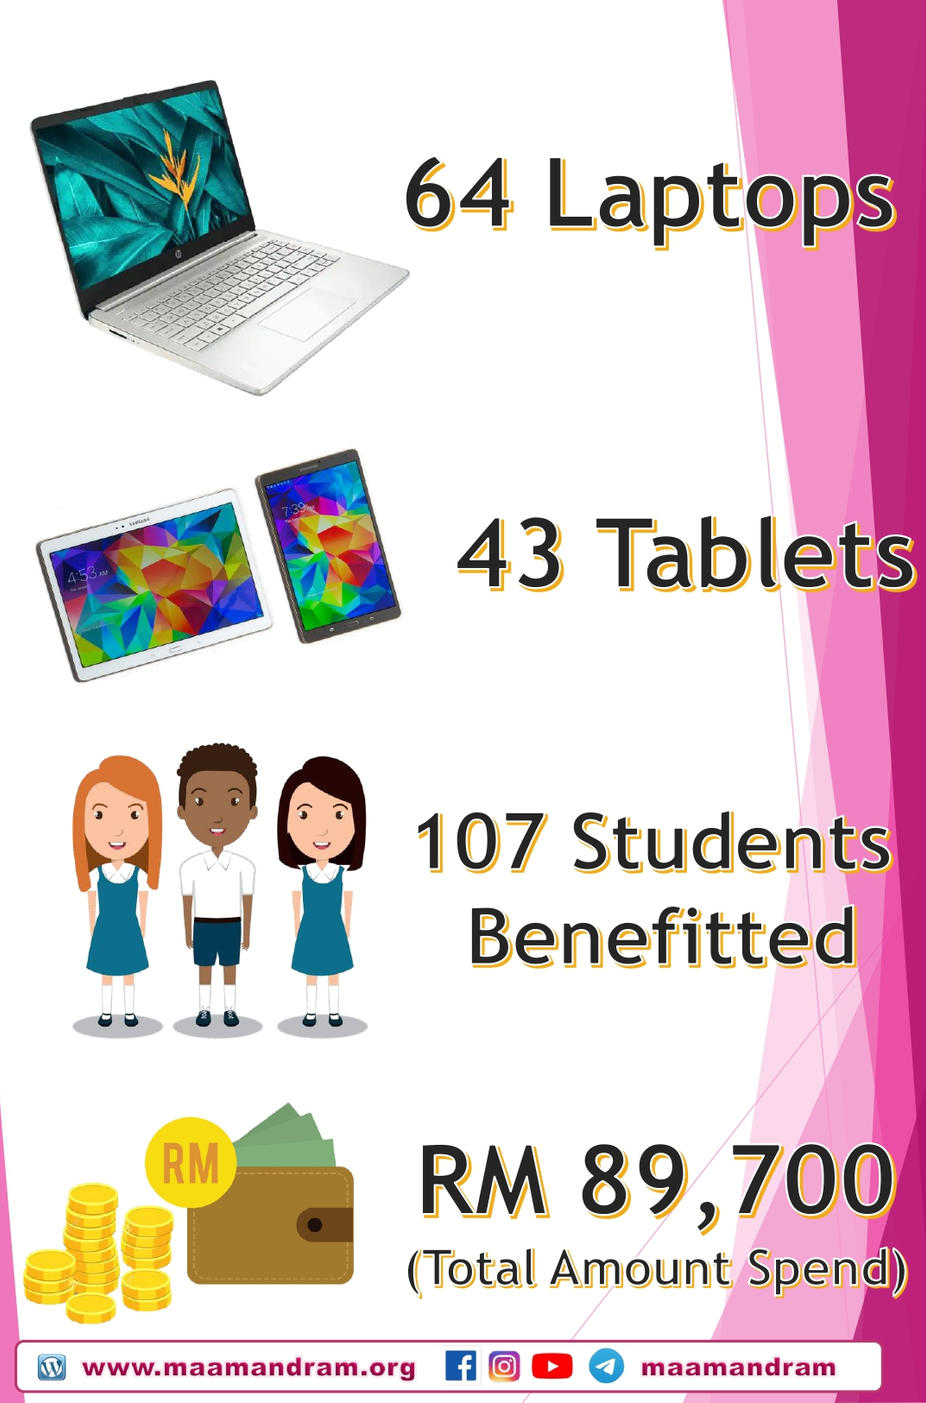 Dharma Welfare - Sub Com - A Student A Gadget - REPORT - Latest_page-0003.jpg